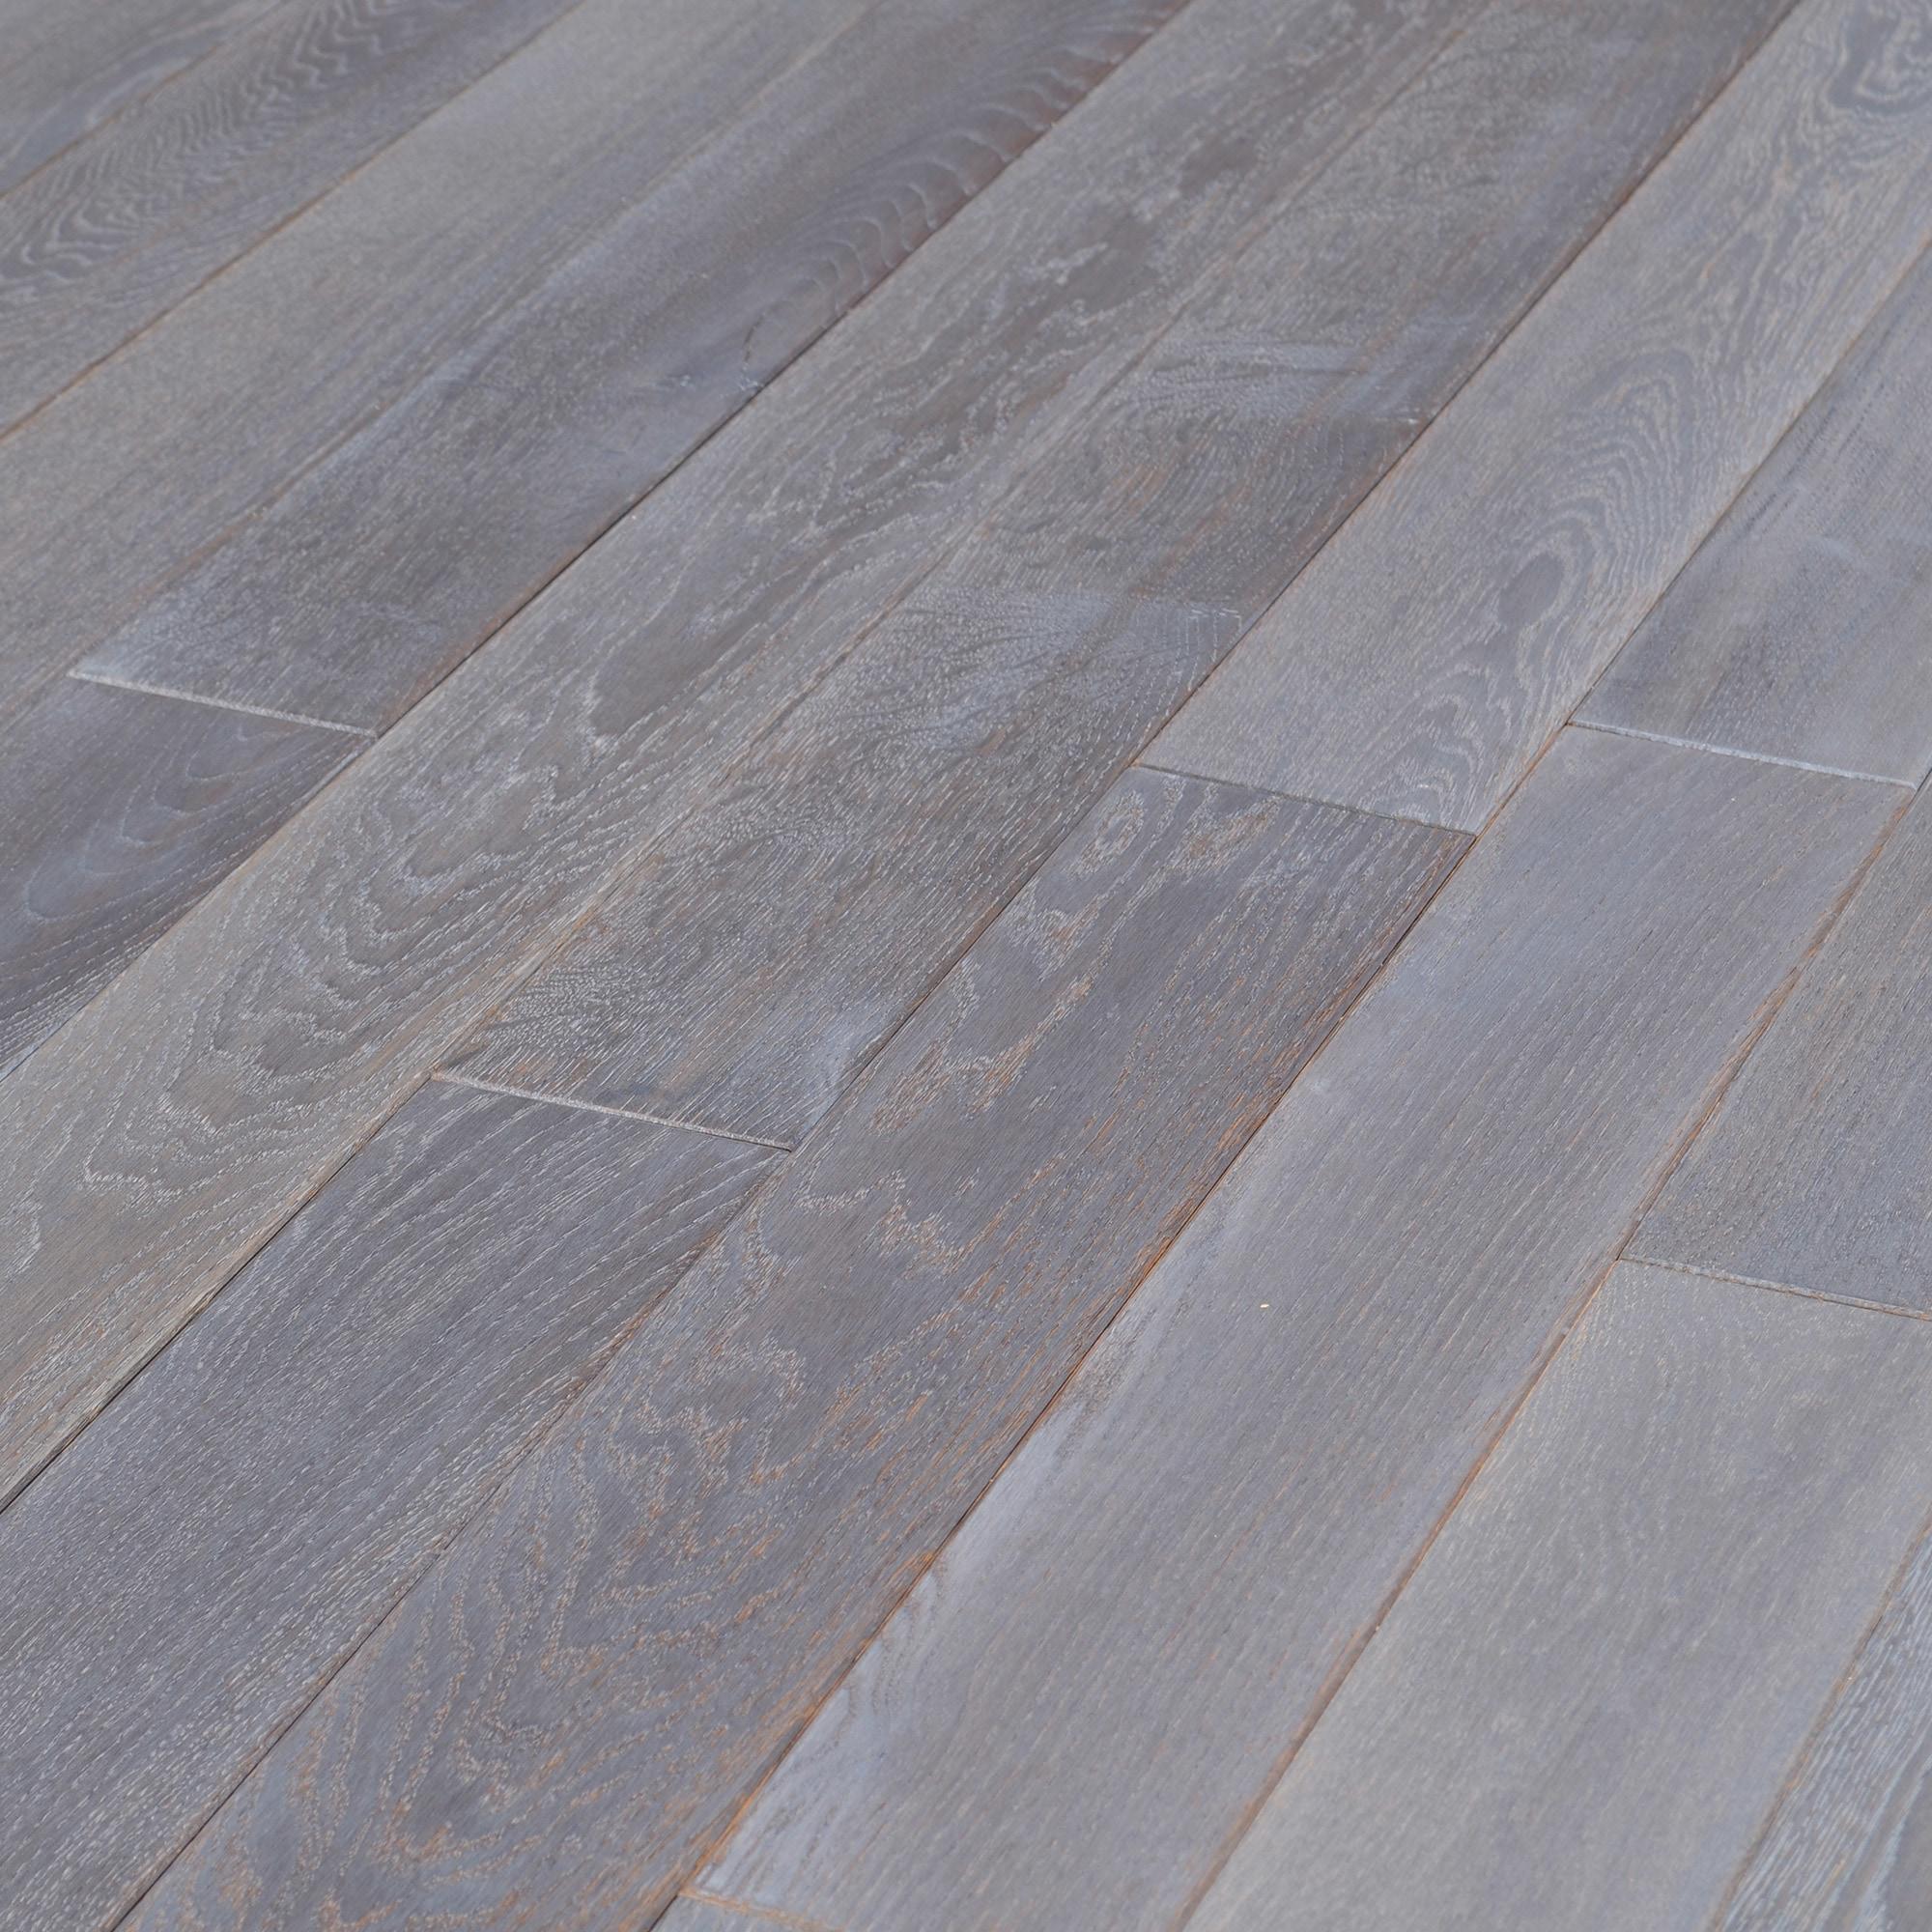 Home Flooring Wood Flooring Hardwood Flooring All Products Sky Gray ...